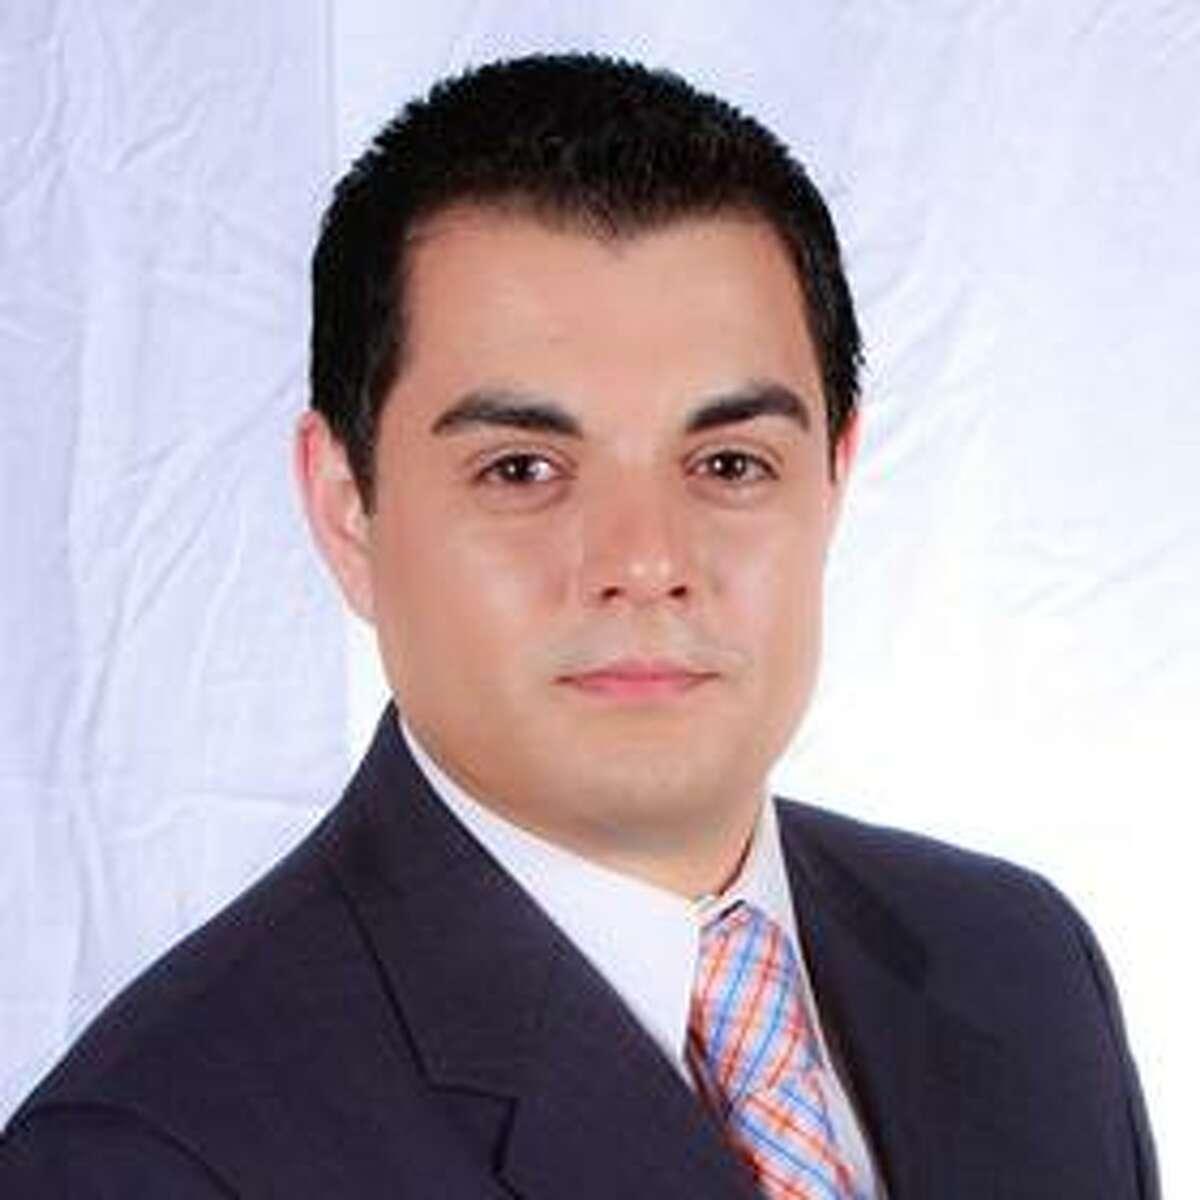 Angel Covarrubias, WOAI reporter